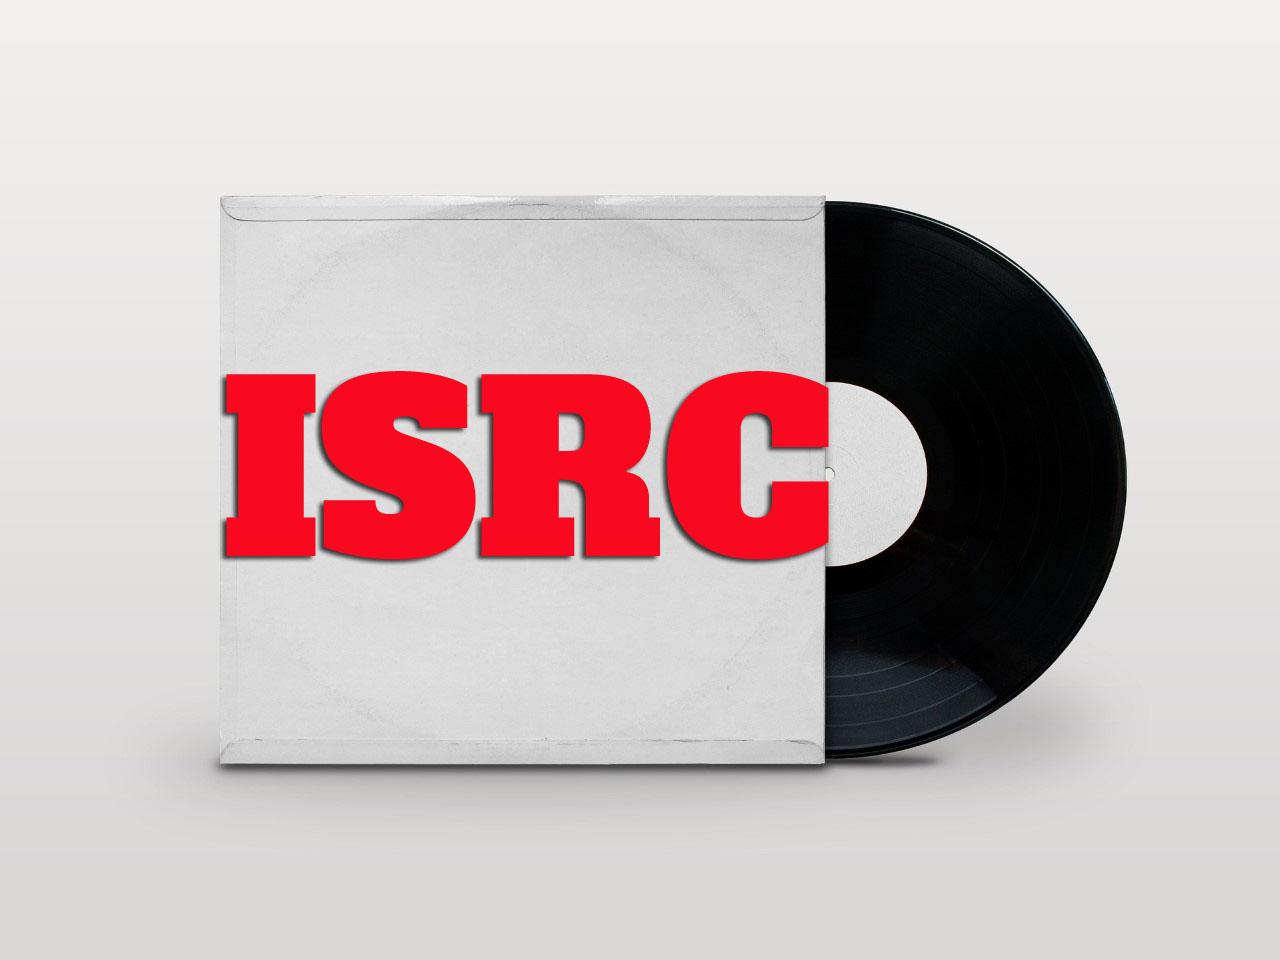 ISRC international standard recording code